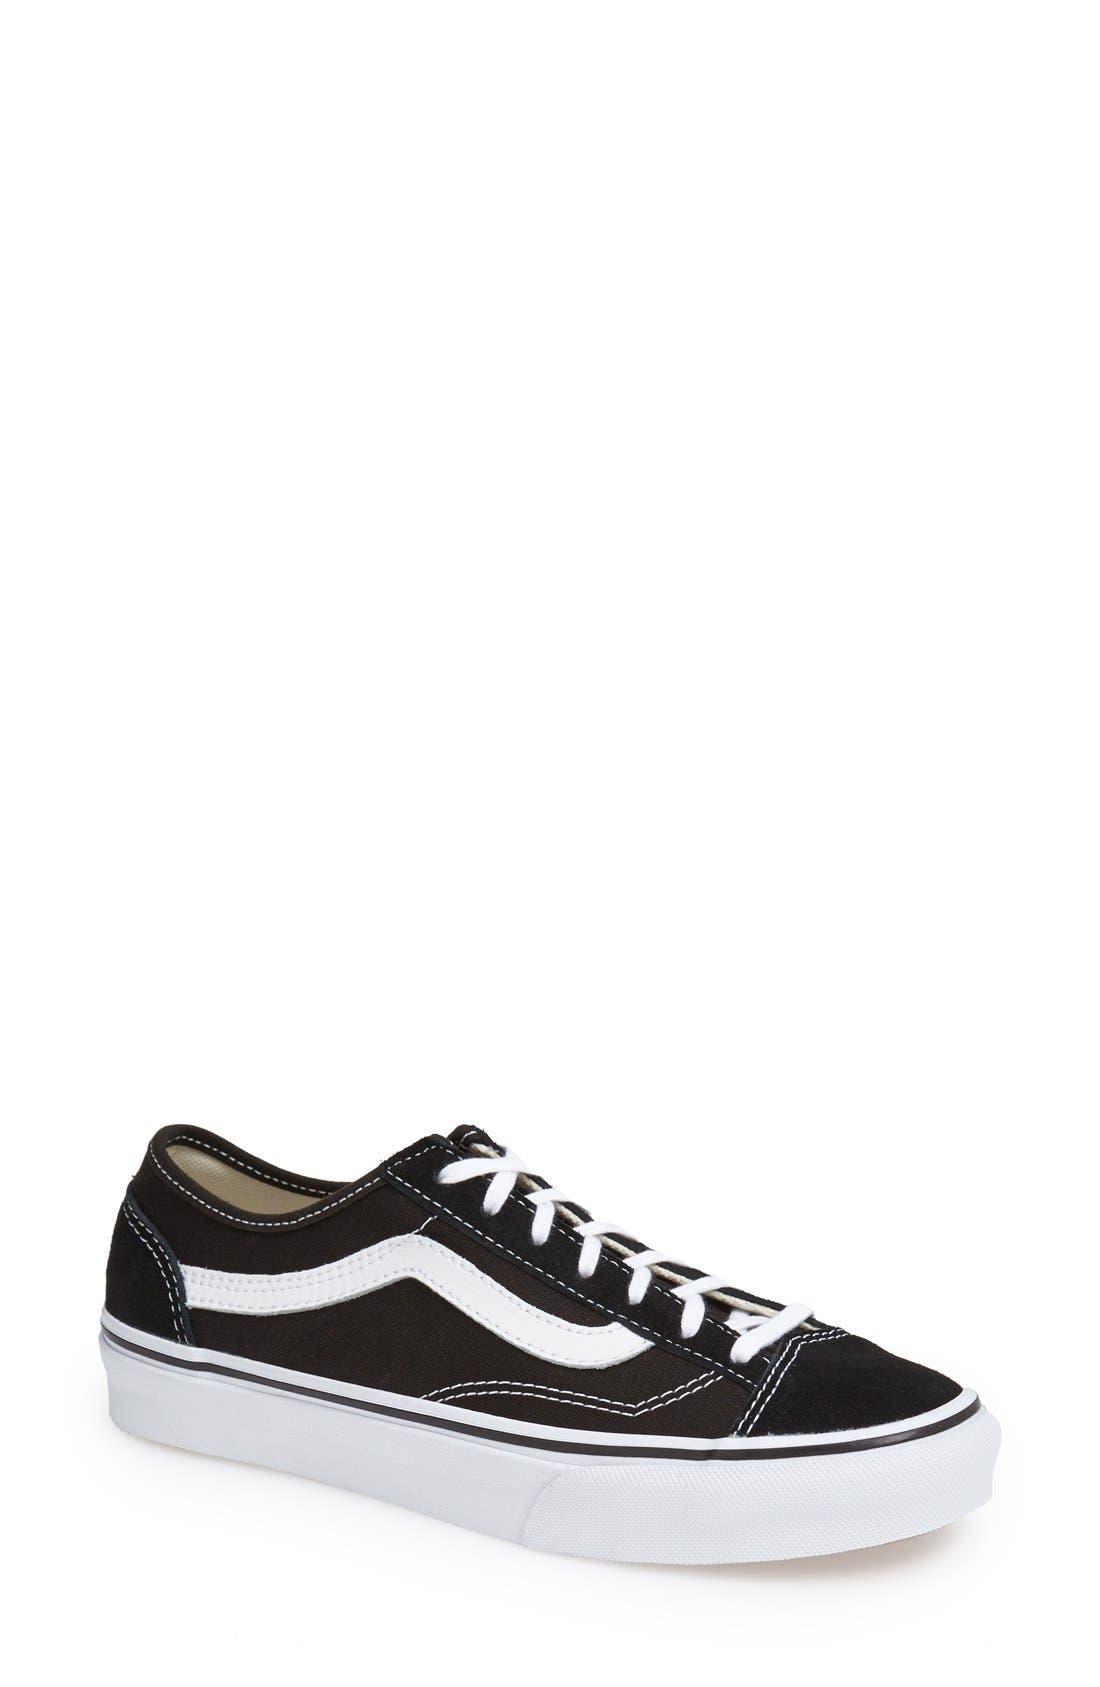 Main Image - Vans 'Style 36' Sneaker (Women)